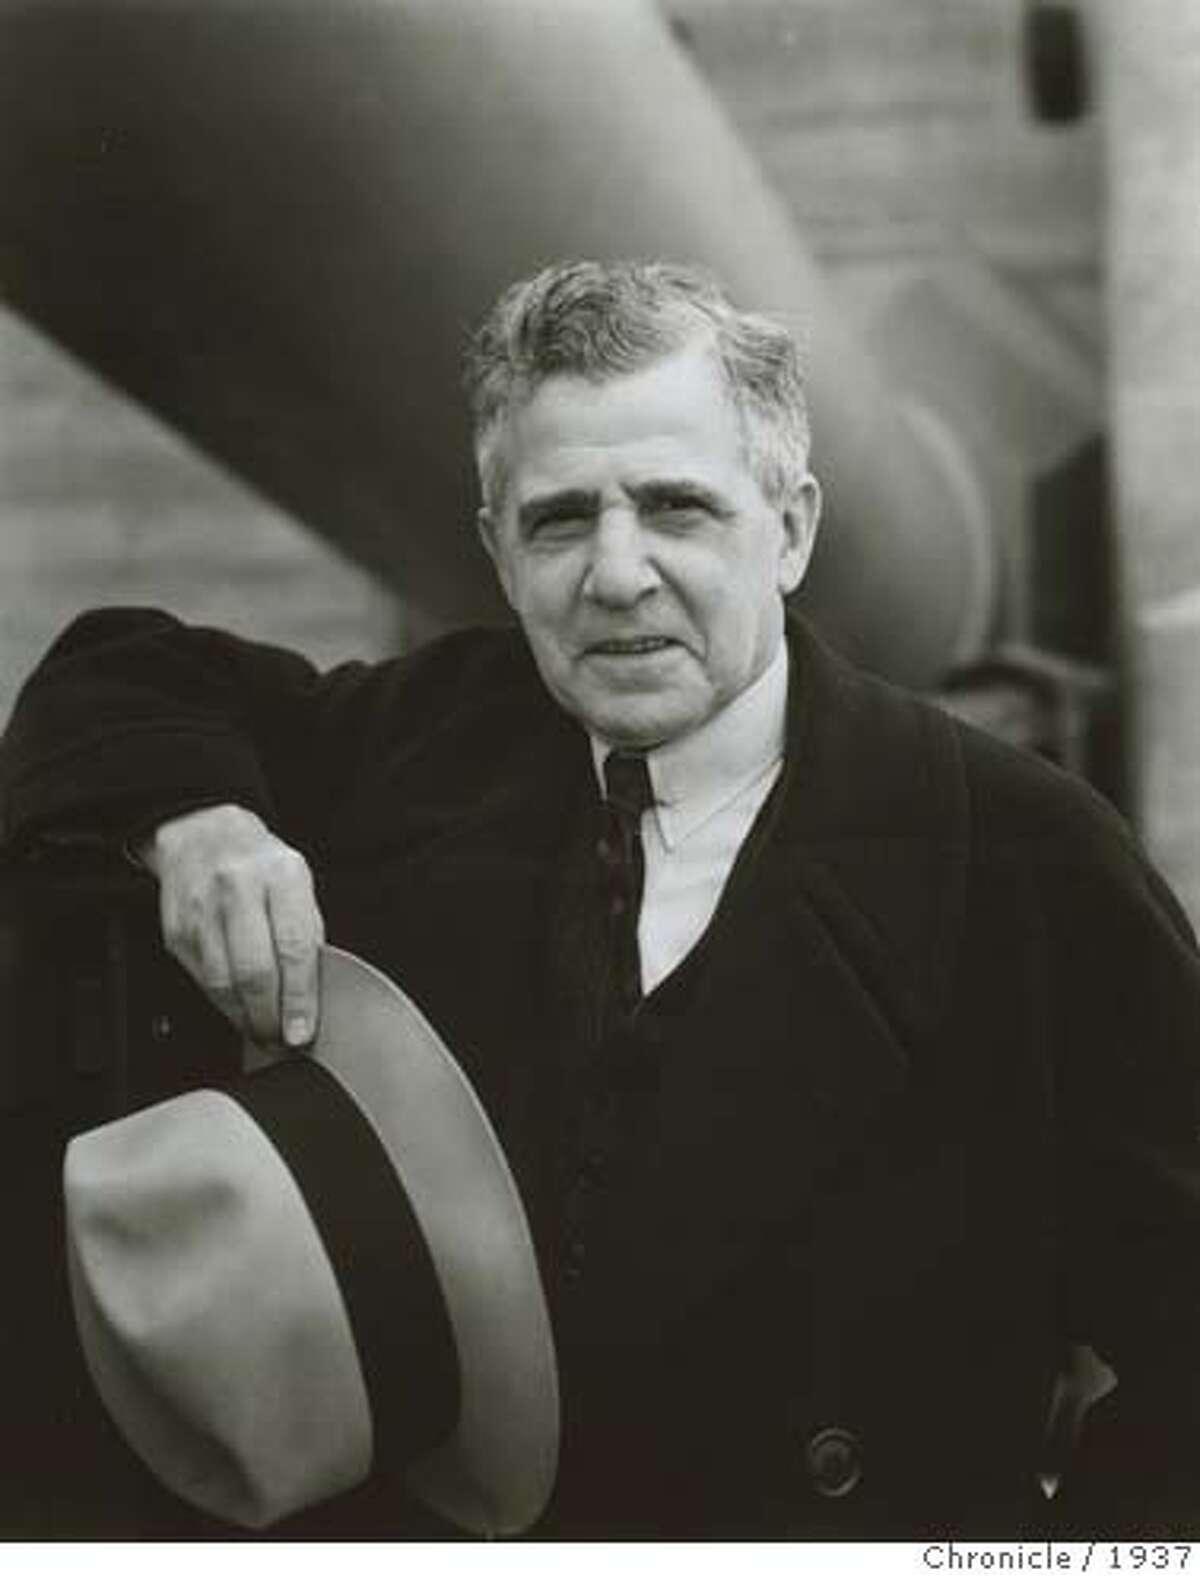 Joseph B. Strauss, chief engineer of the Golden Gate Bridge in 1937 photograph.